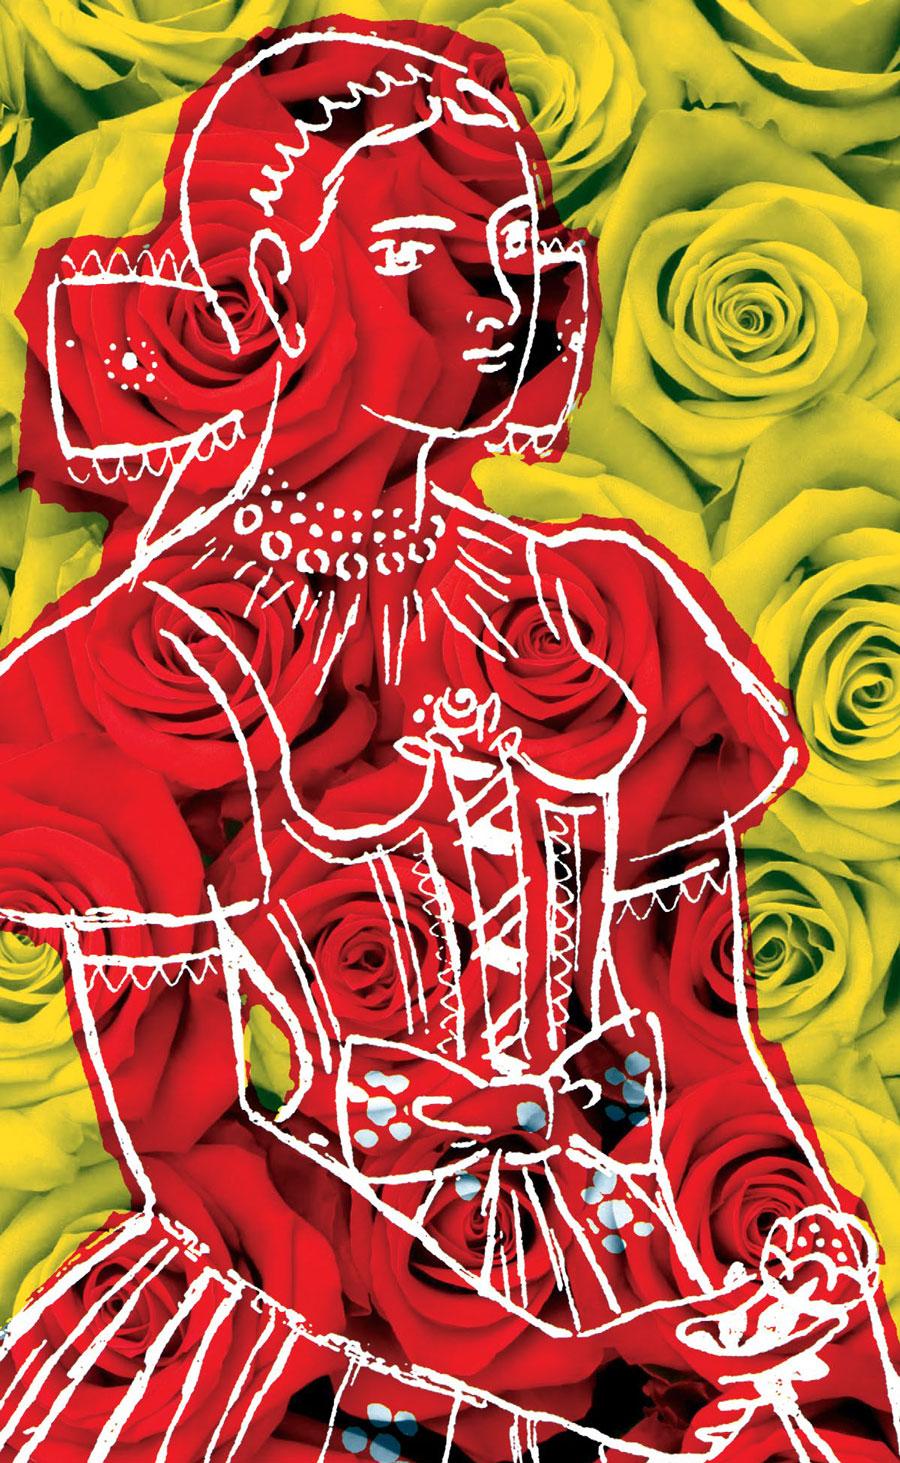 image for UBC Opera production of Smetana opera The Bartered Bride